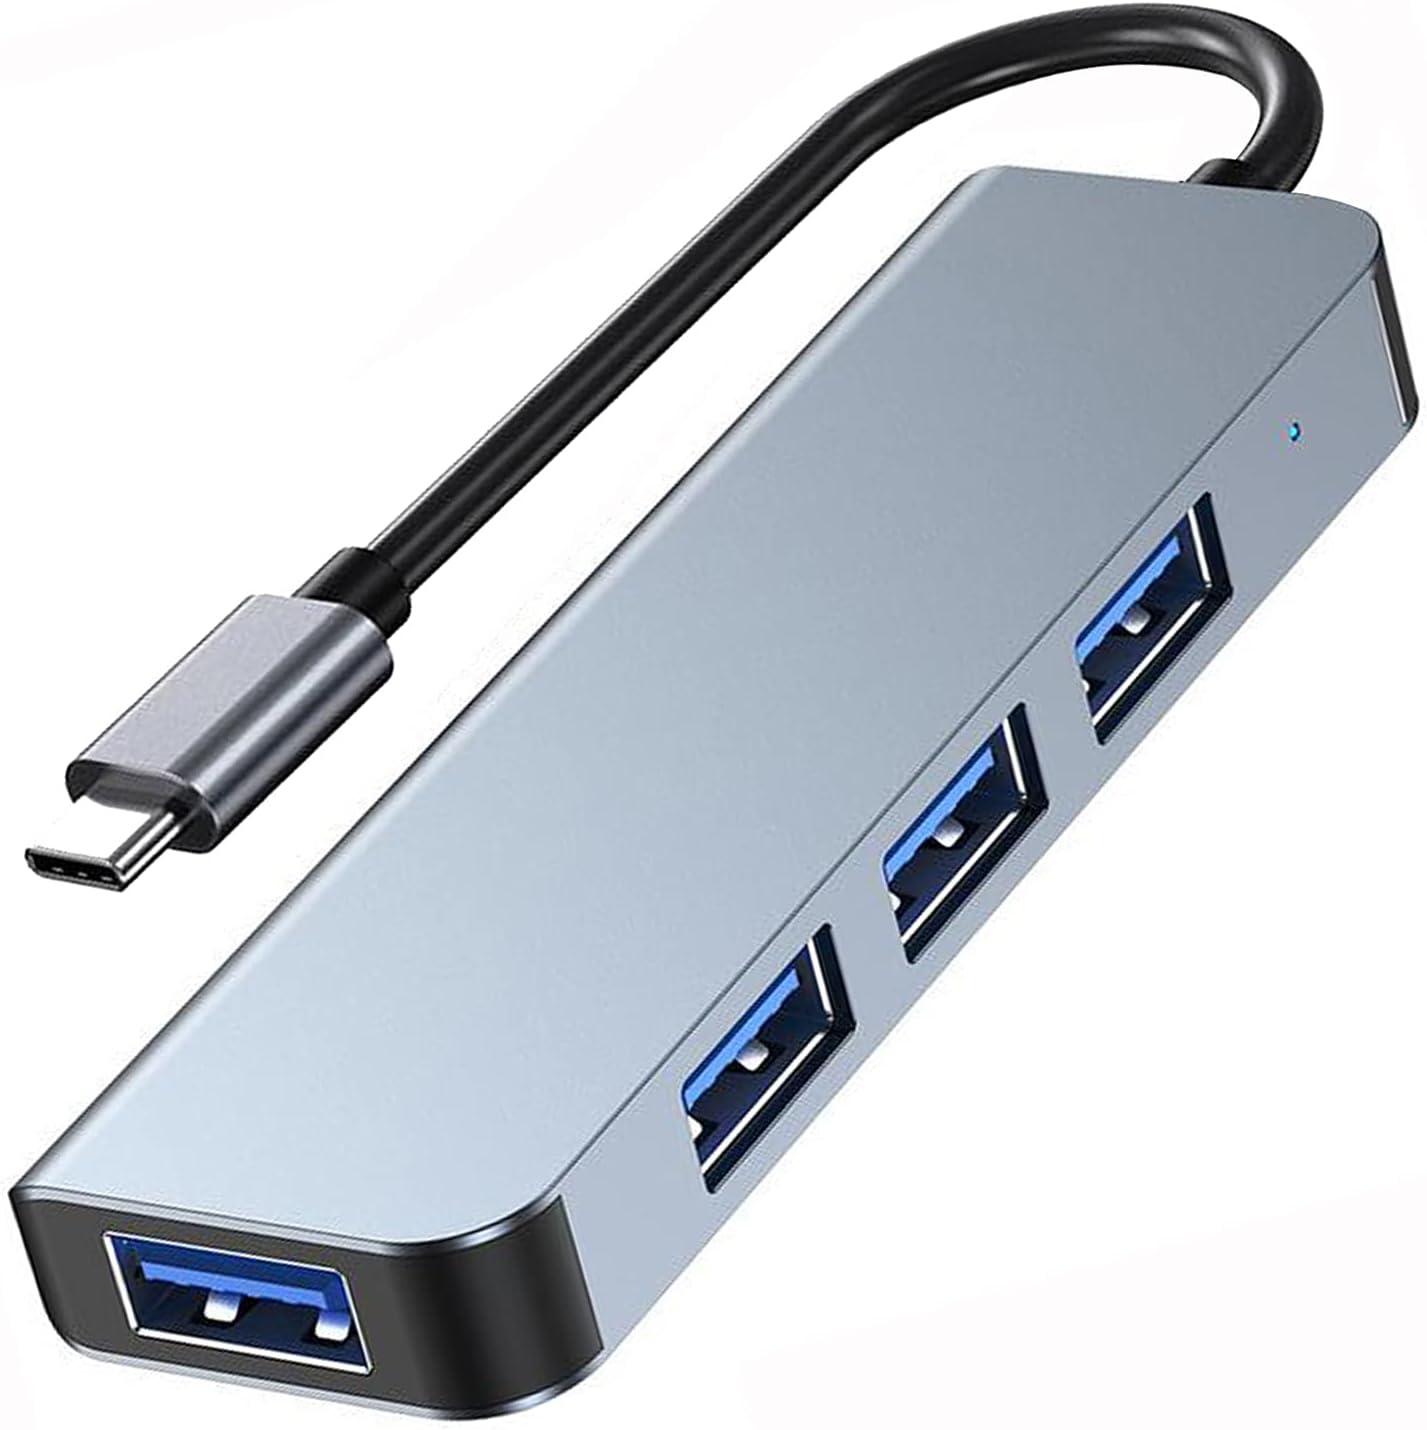 VikTck USB C to USB Hub 4 Ports,USB Type C to USB 3.0 Hub Adapter Thunderbolt 3 to USB Hub for MacBook Pro,iMac,iPad Pro,Surface Pro,Google,Chromebook,XPS,Notebook PC,Drives,Mobile HDD and More